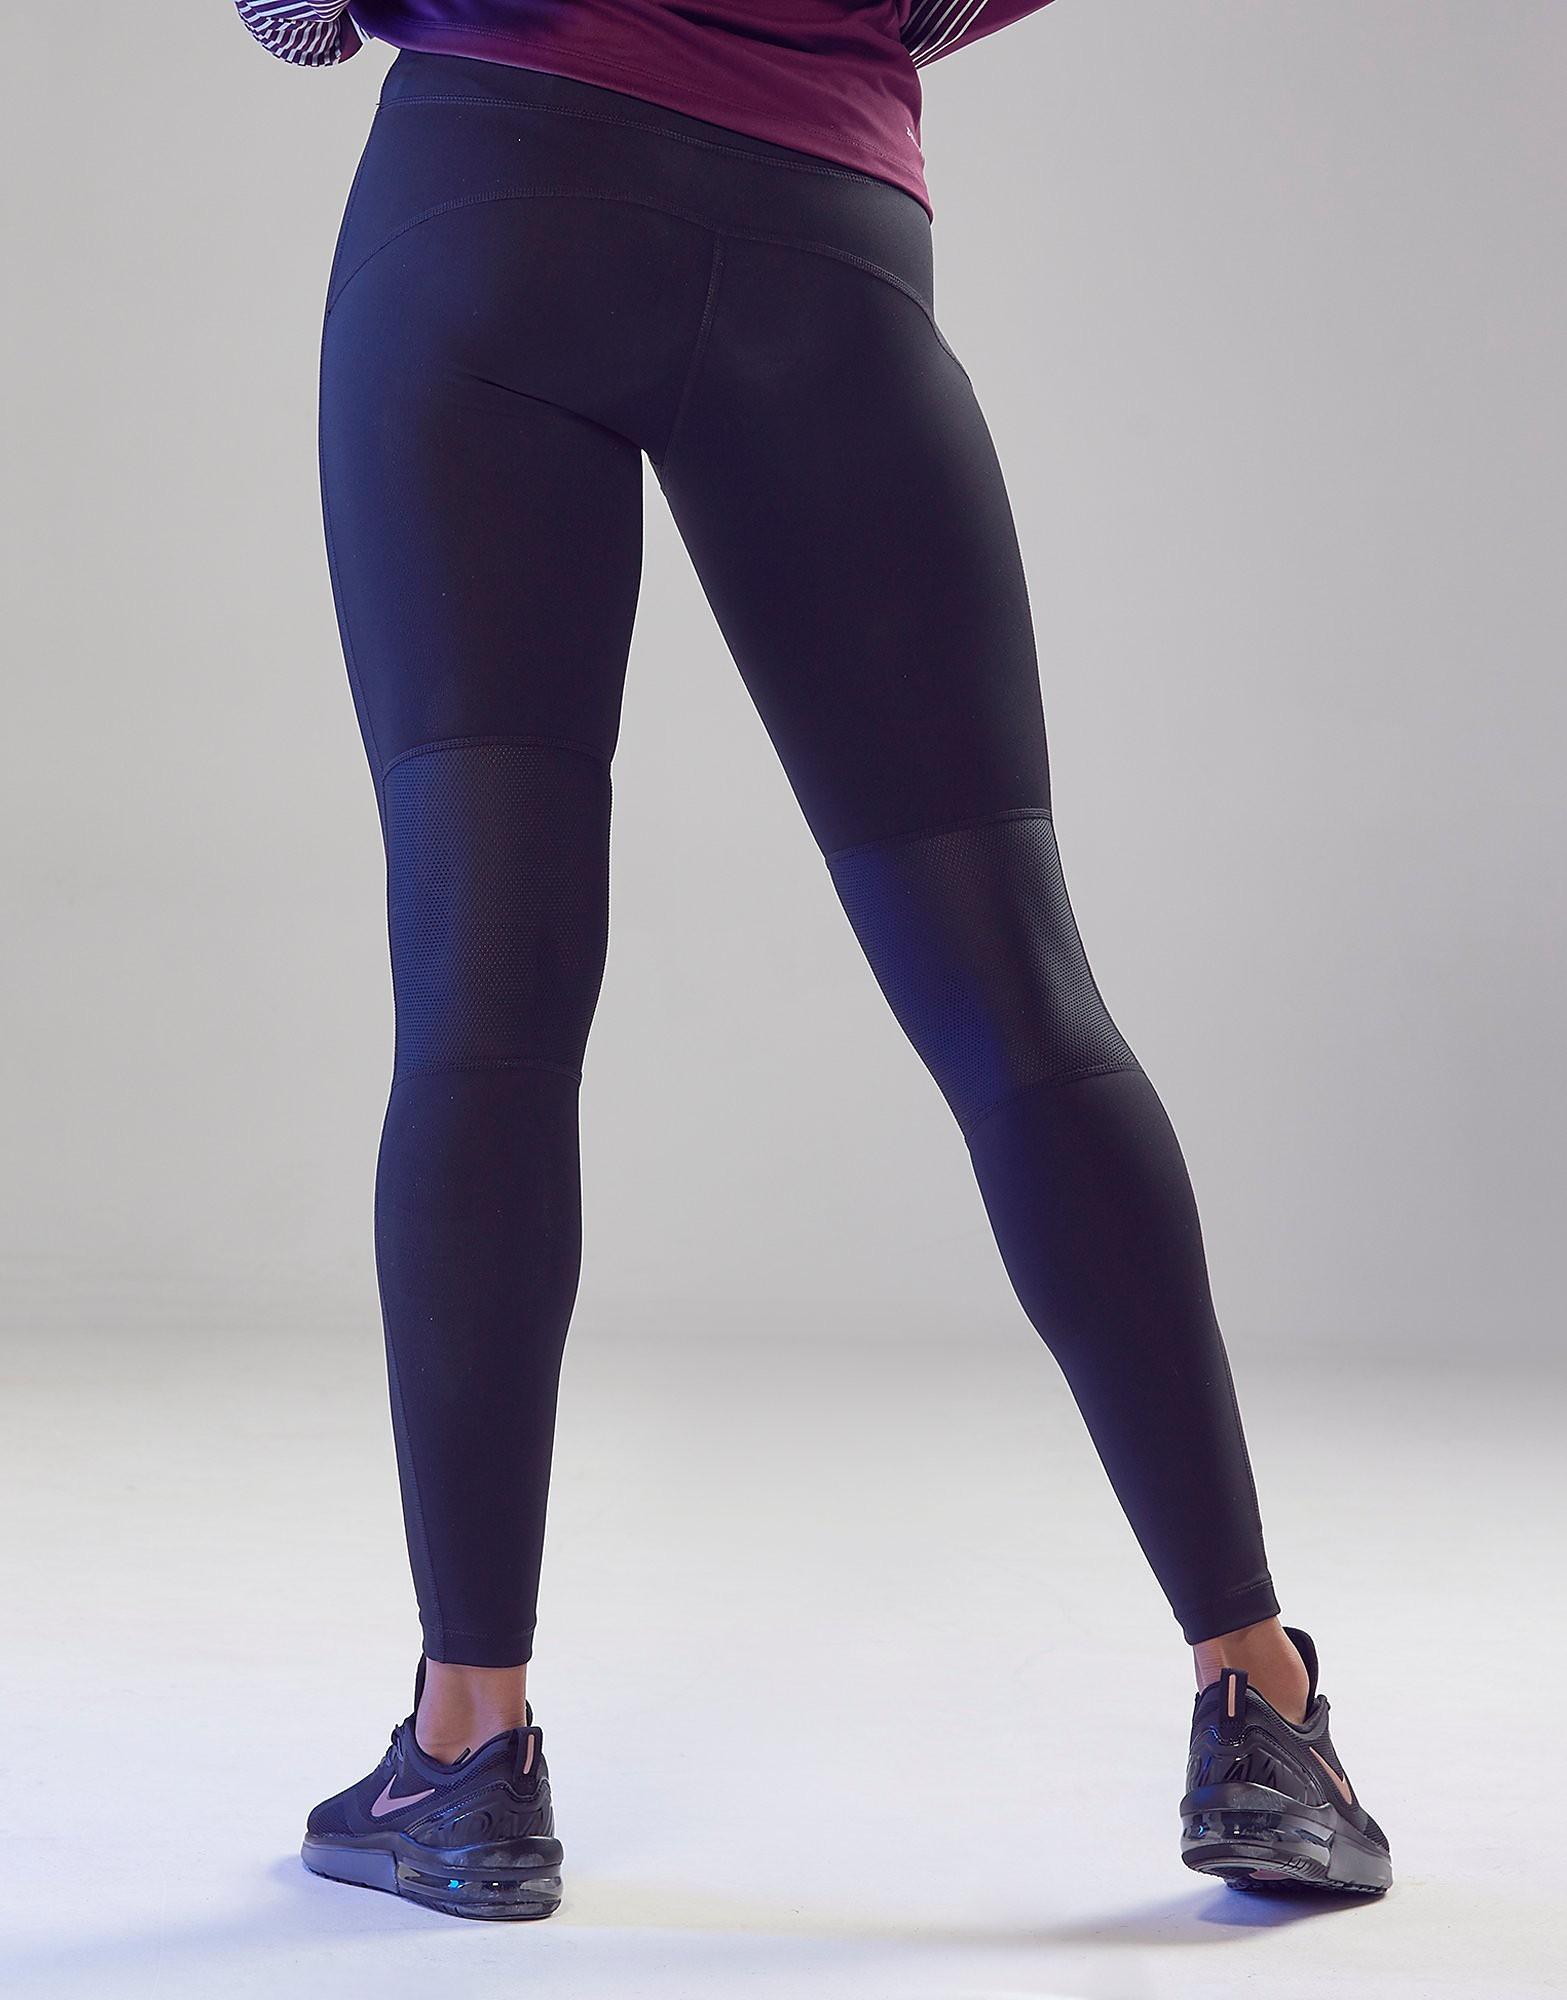 Nike Flash Racer Running Tights